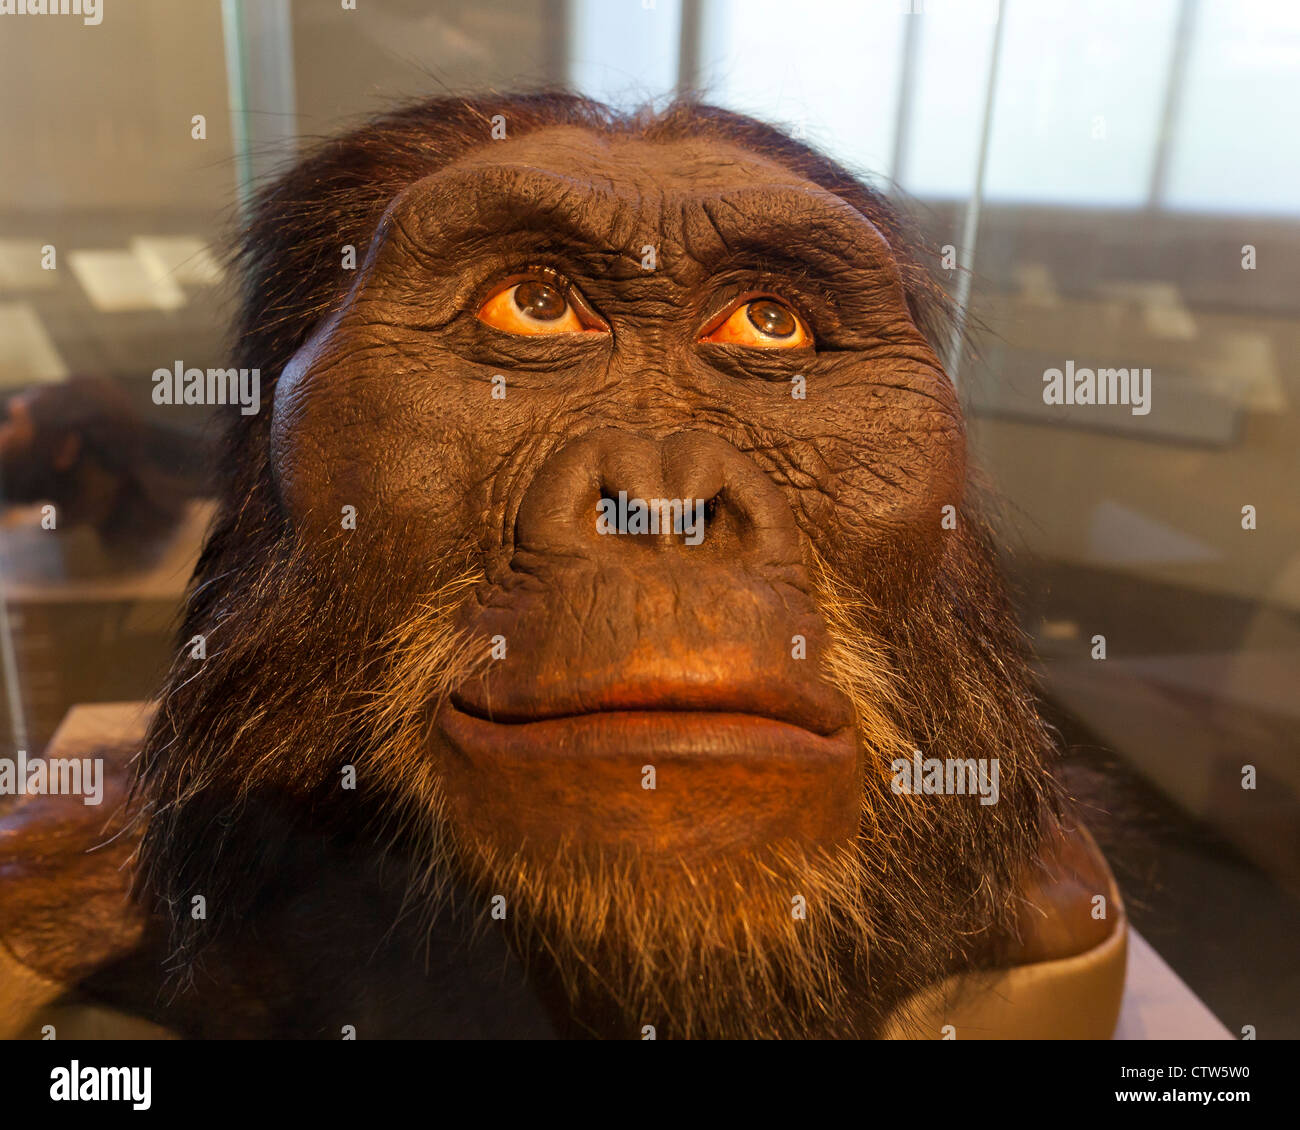 Australopithecus afarensis reconstruction - American Museum of Natural History - Stock Image